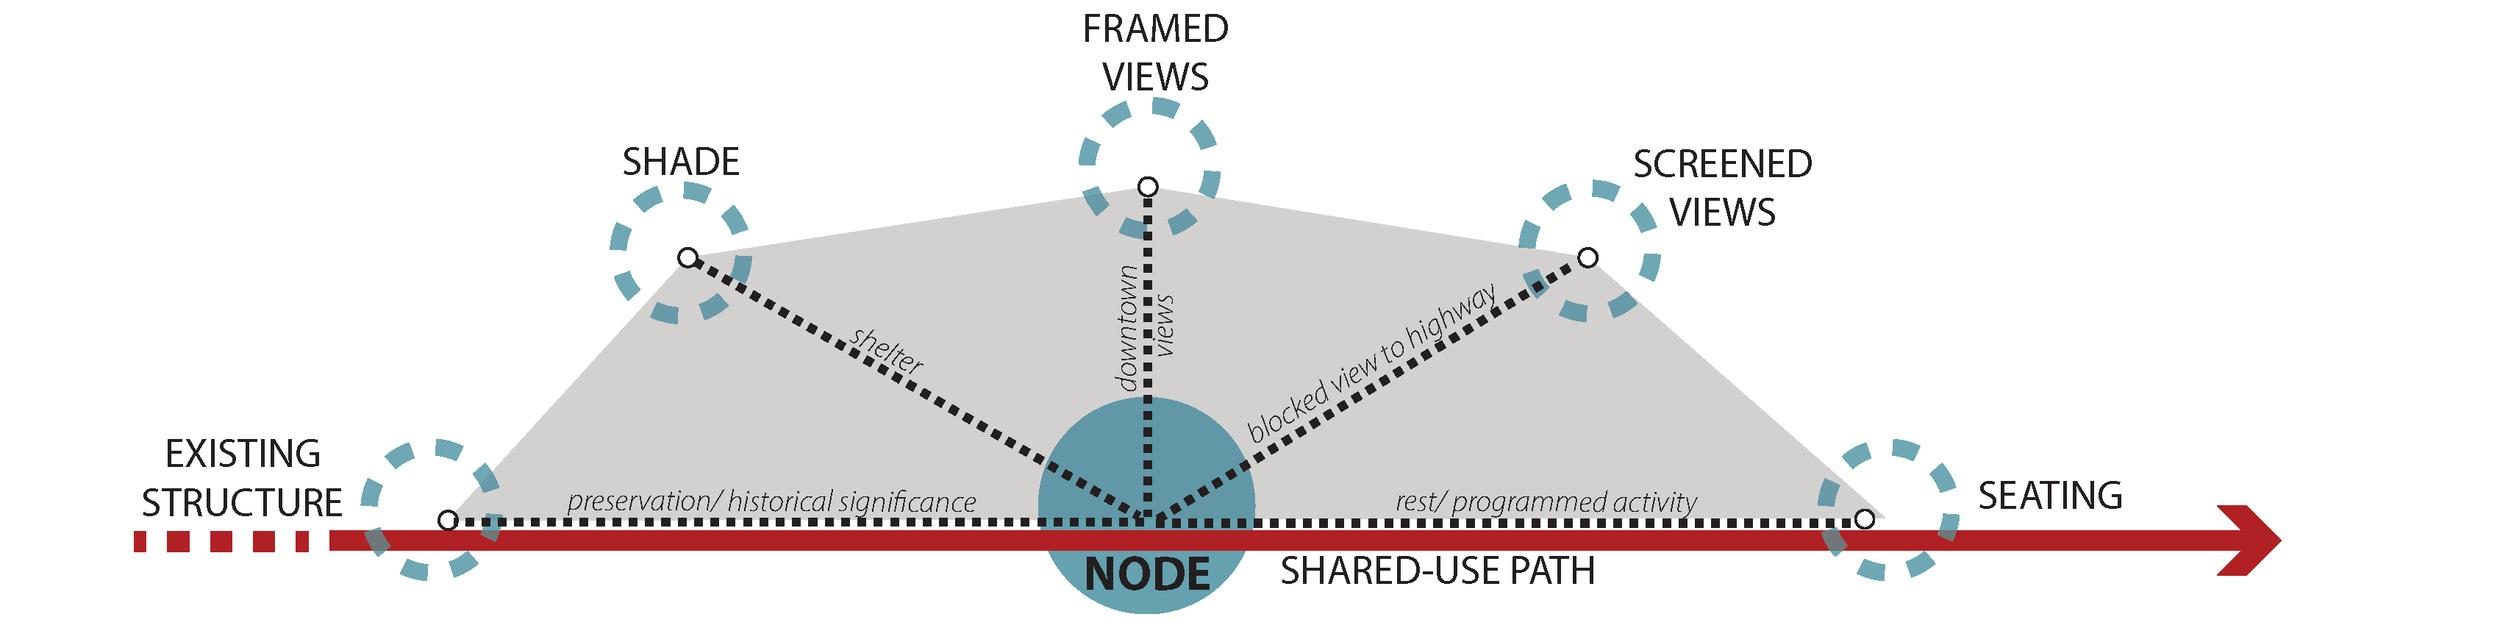 Conceptual+Diagram+2.jpg